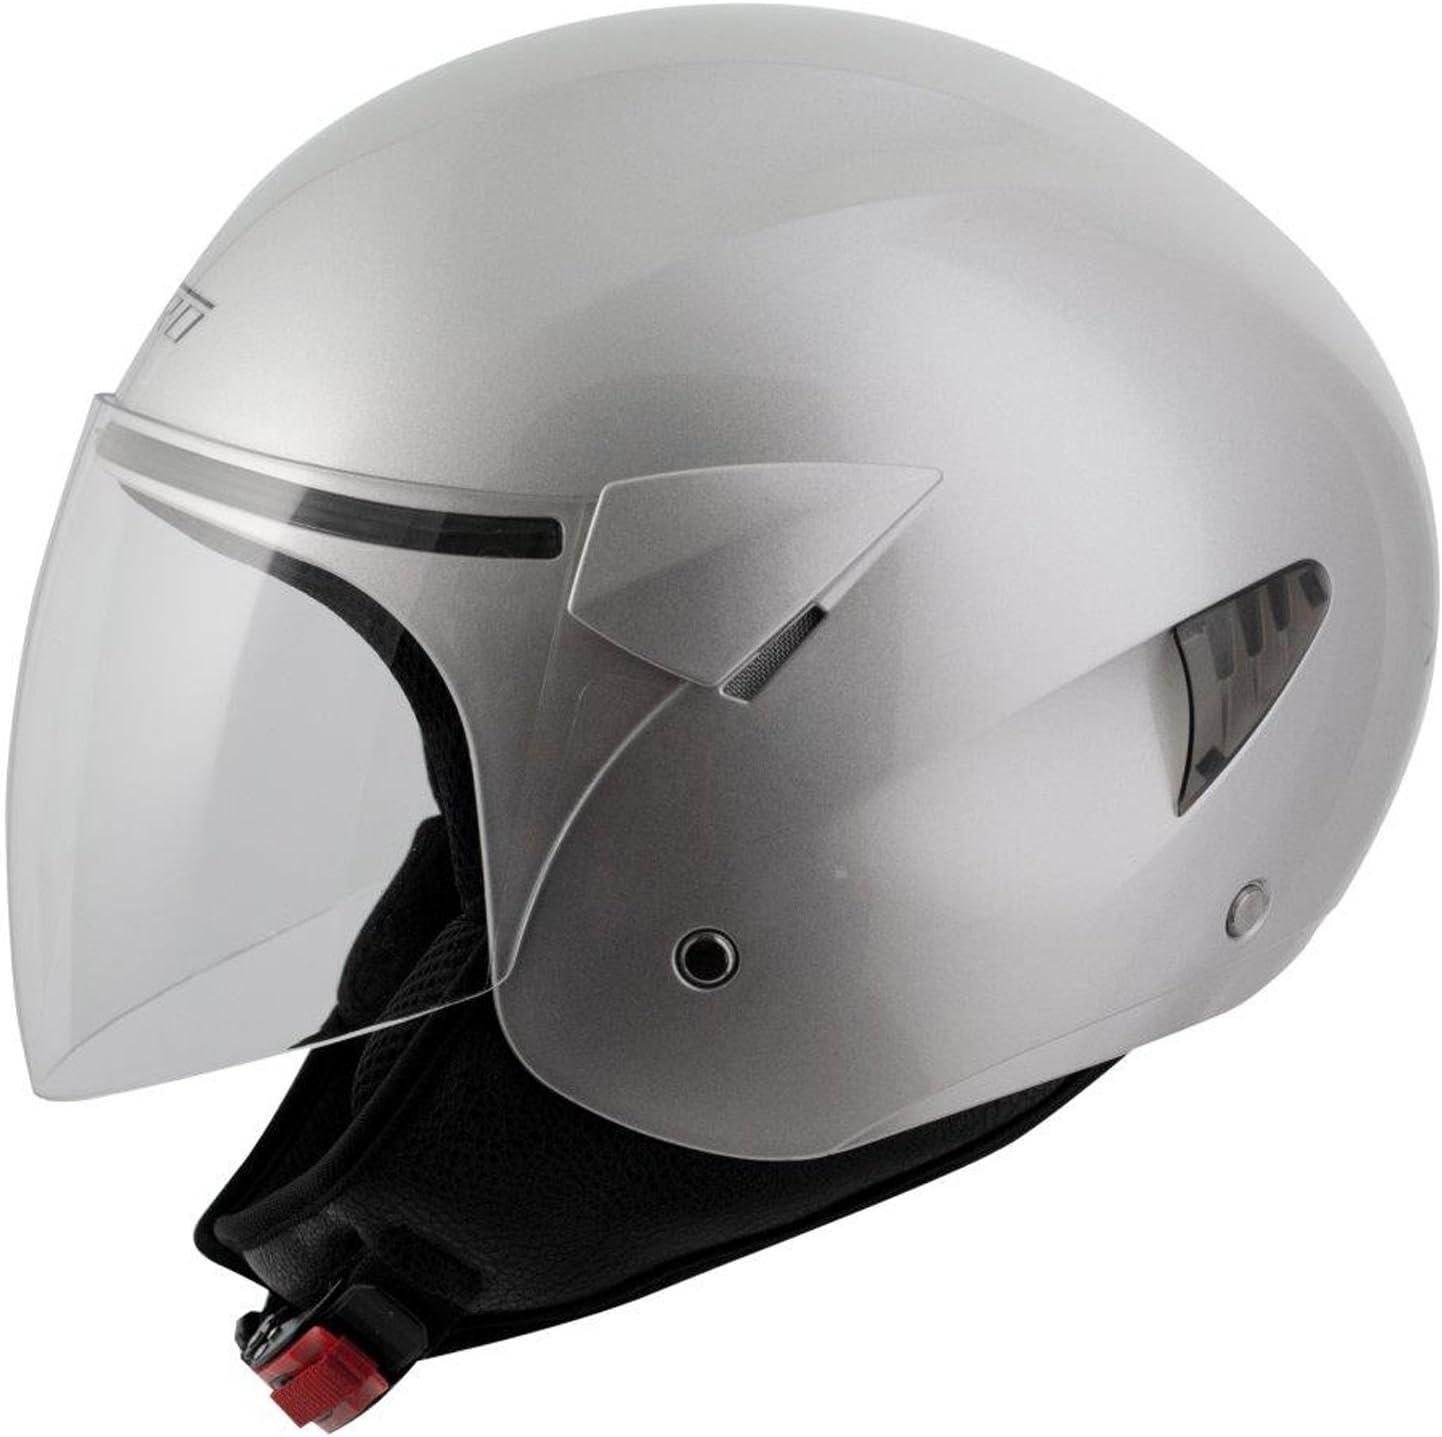 A-Pro Motorradhelm Motorrad Roller Jet Helm Demi Jet Scooter Schwarz L